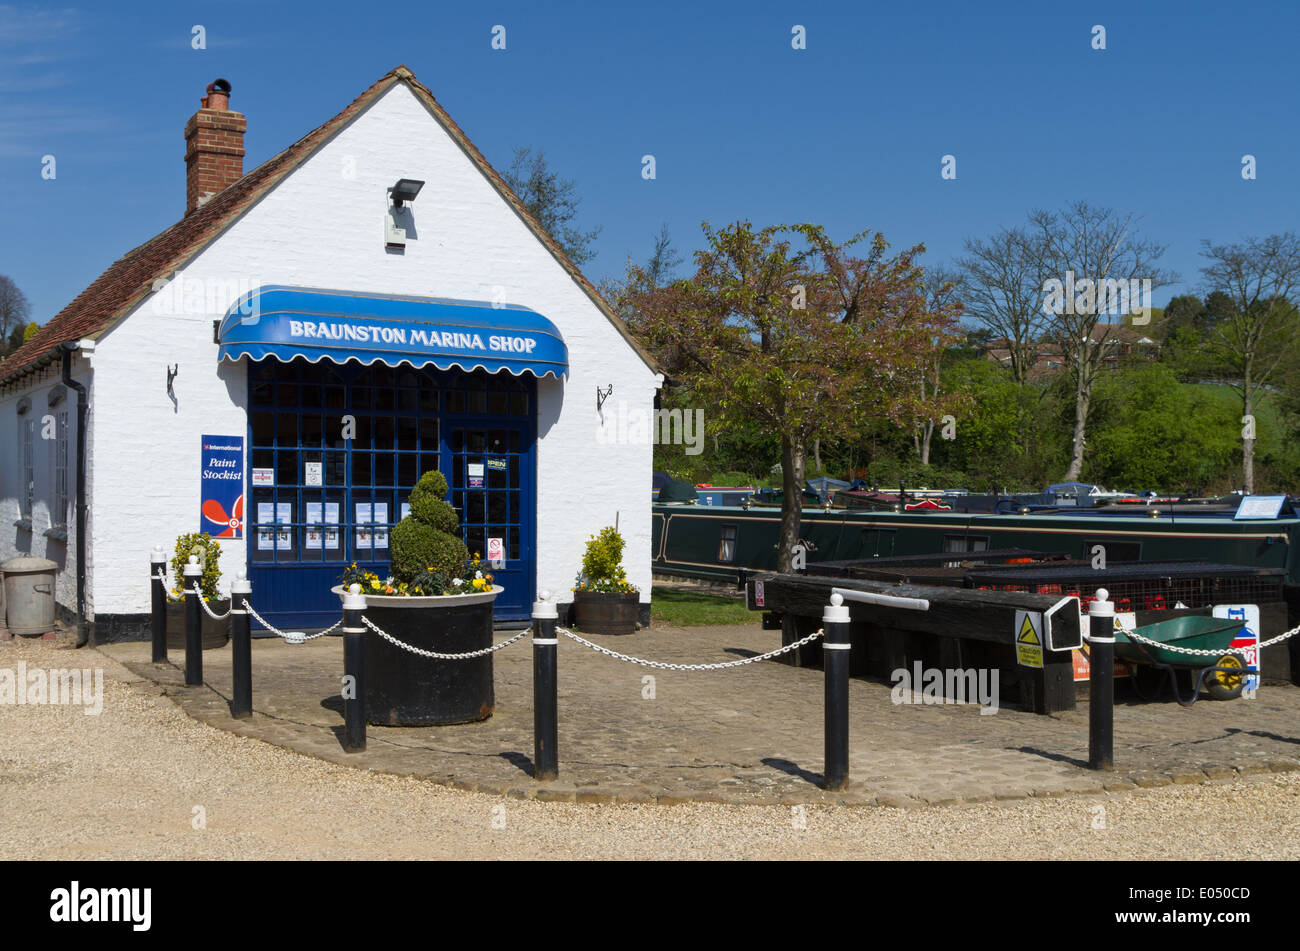 Shop at Braunston Marina, UK - Stock Image